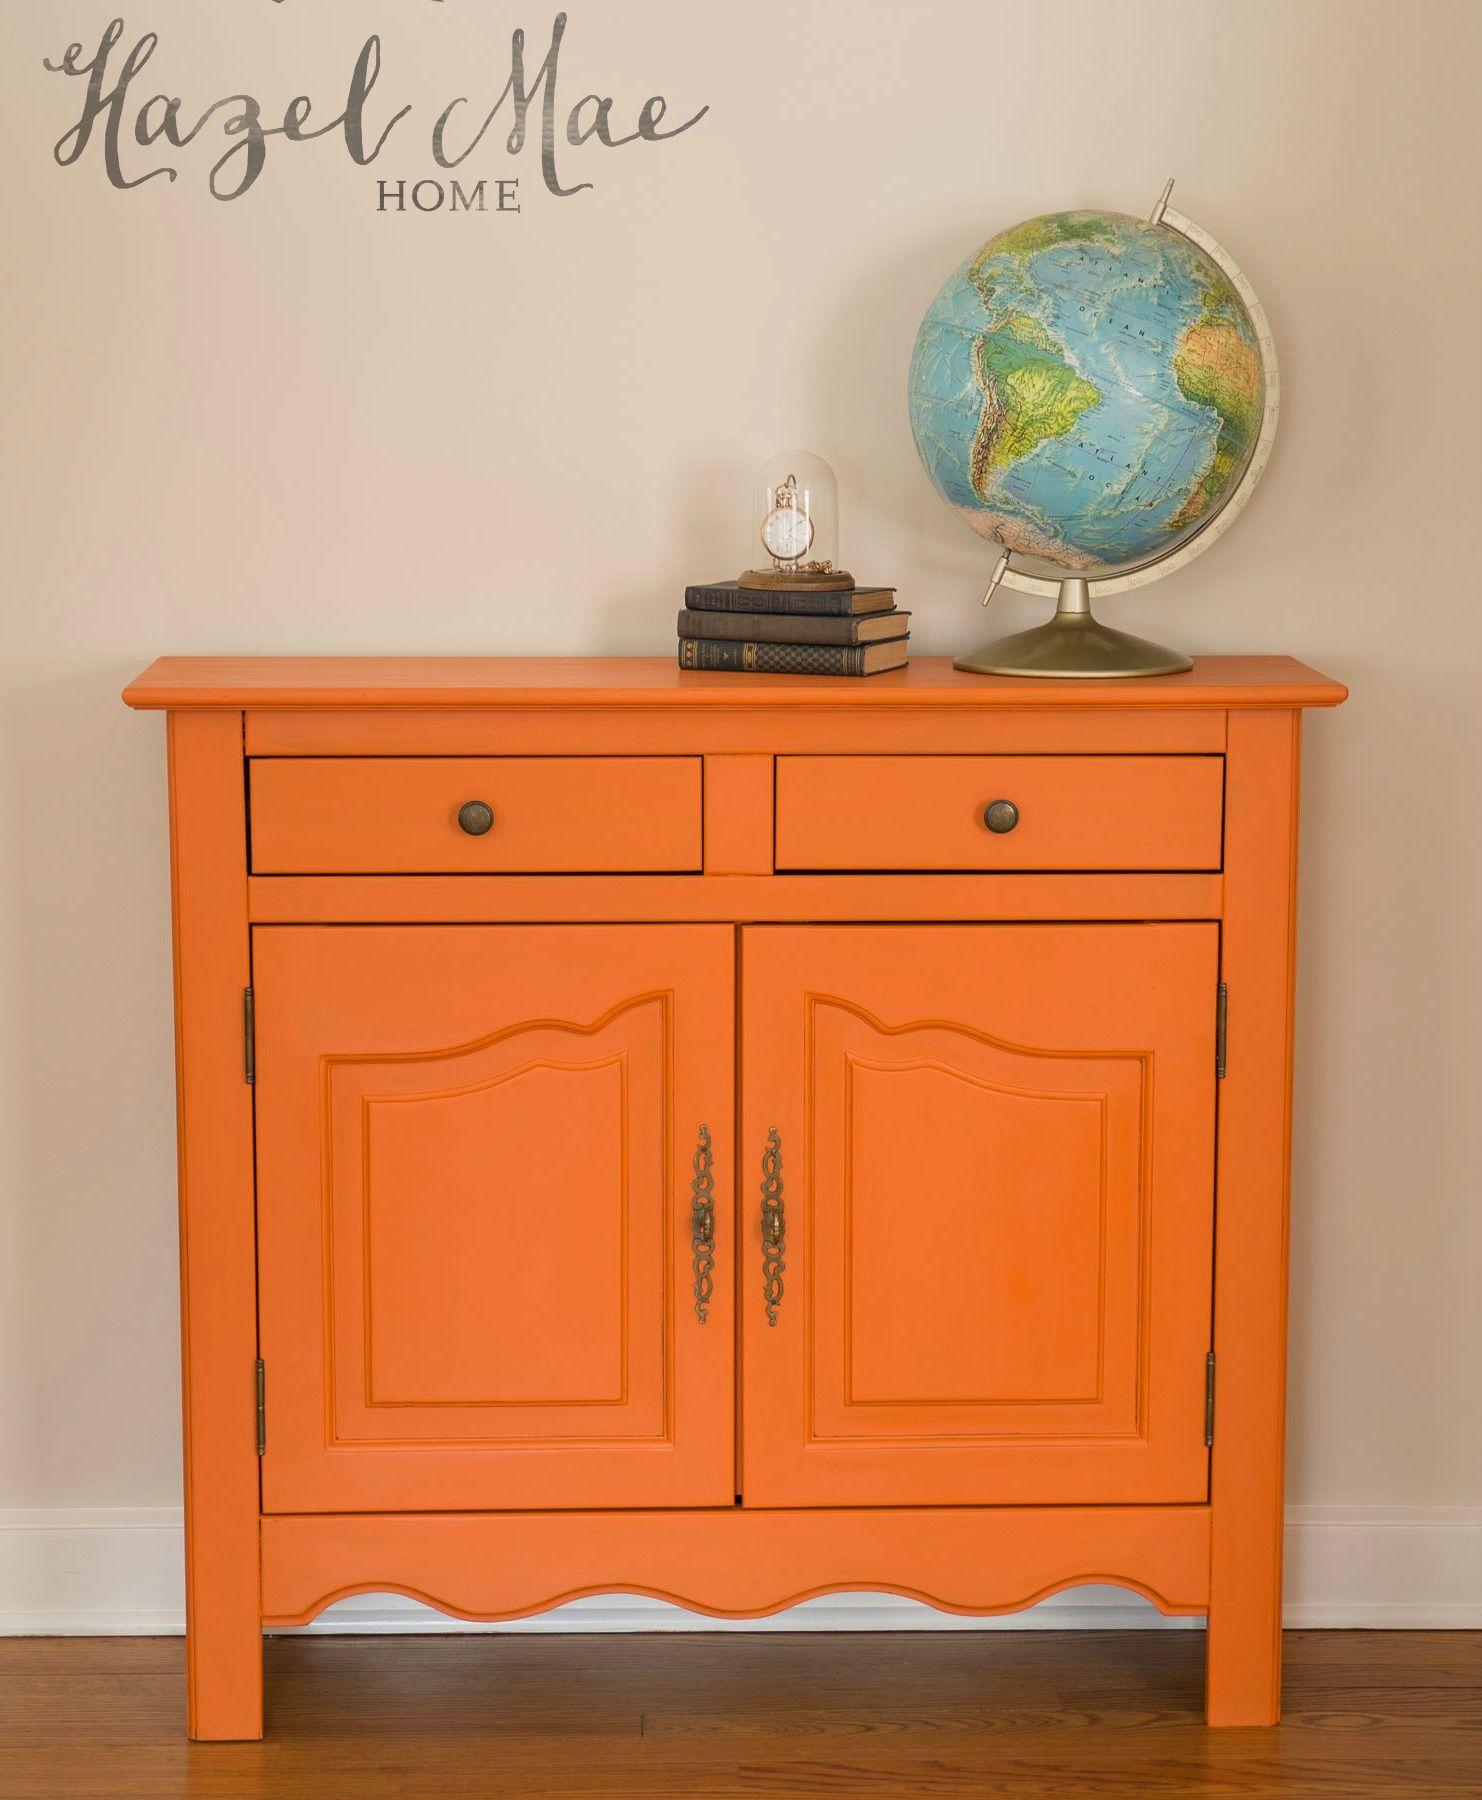 Chalk Paint For Kitchen Cabinets Uk: Annie Sloan Barcelona Orange Cabinet {by Hazel Mae Home